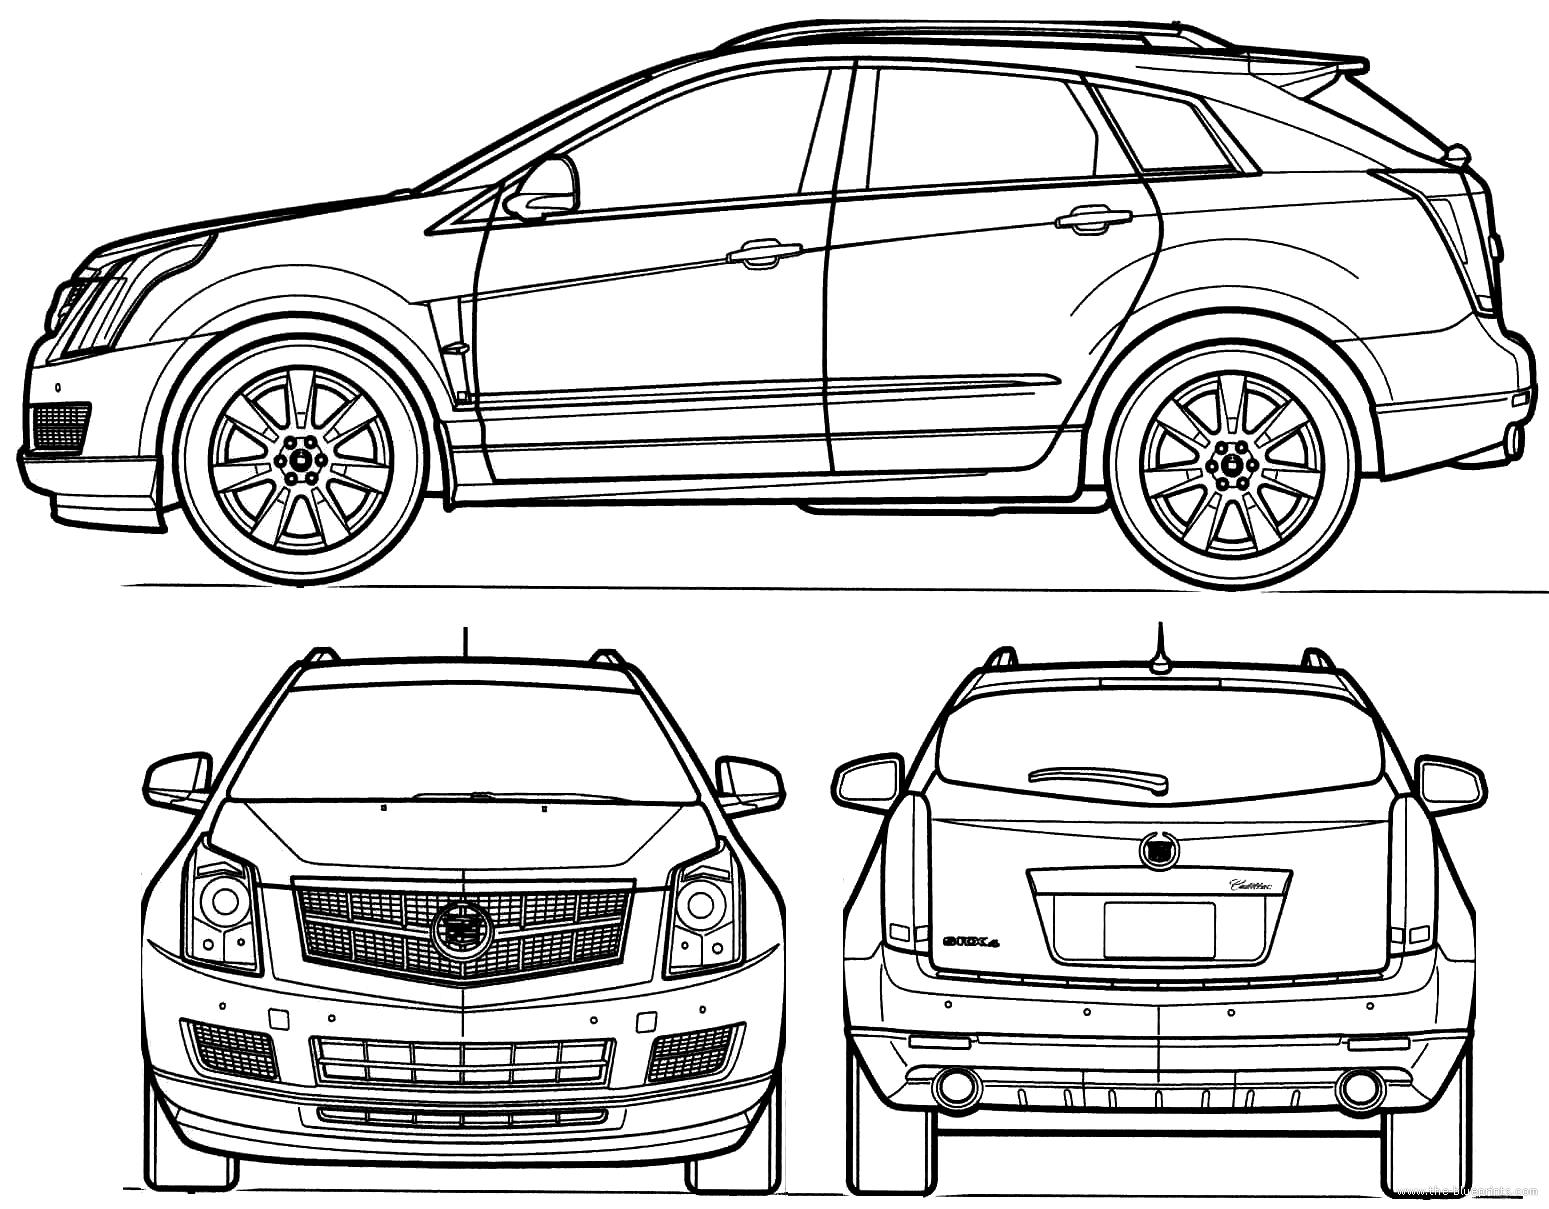 Blueprints Gt Cars Gt Cadillac Gt Cadillac Srx